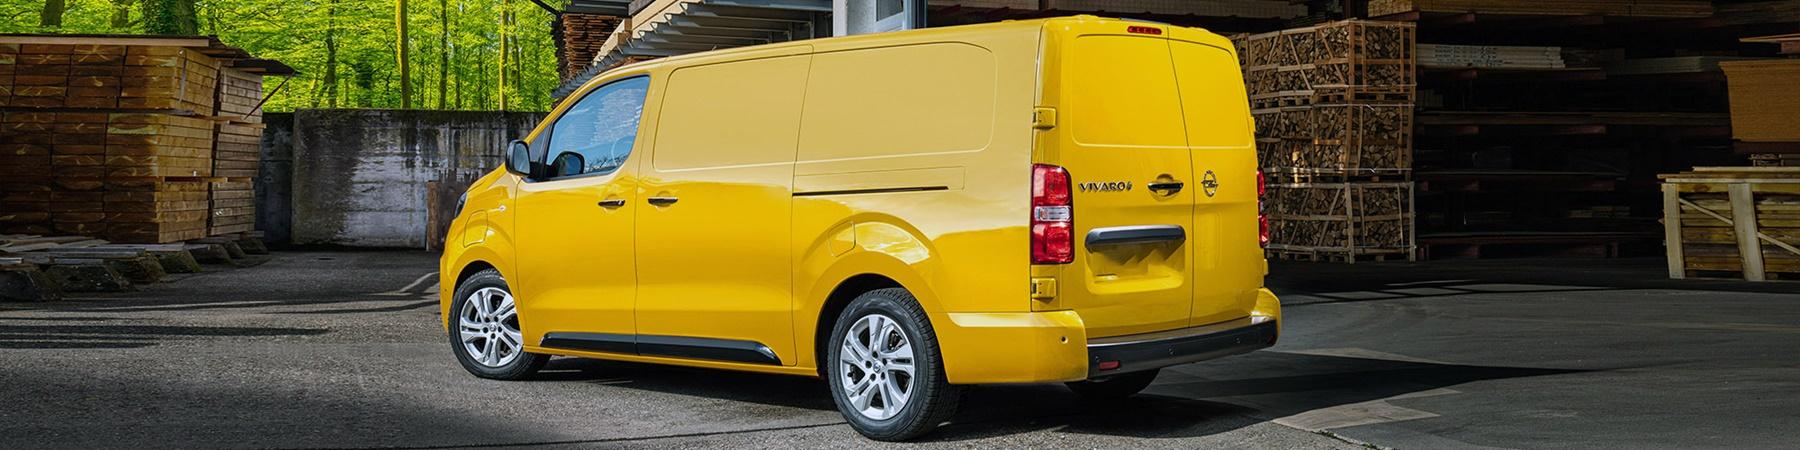 Opel Vivaro Combi 75kWh 280 km actieradius